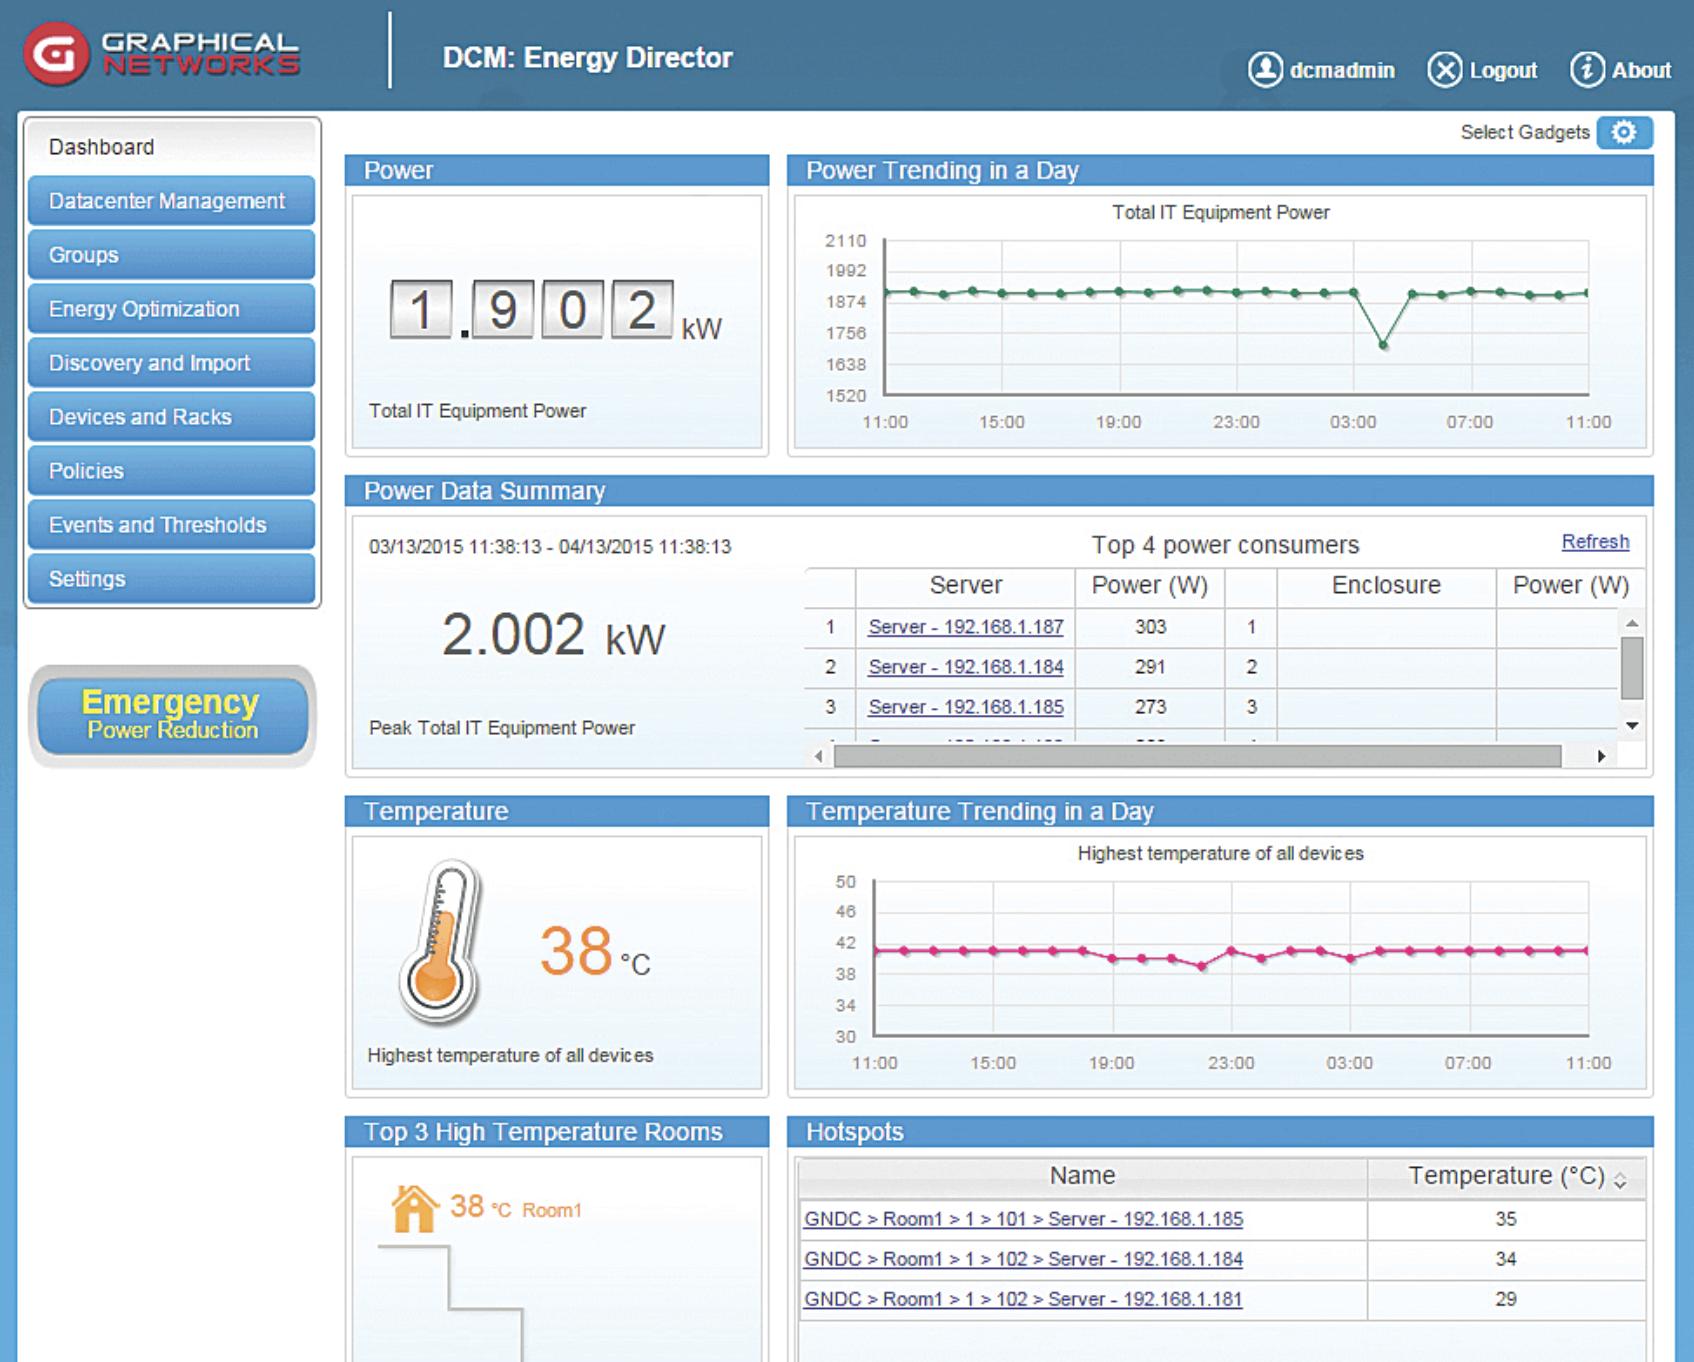 netTerrain Power Usage Dashboard